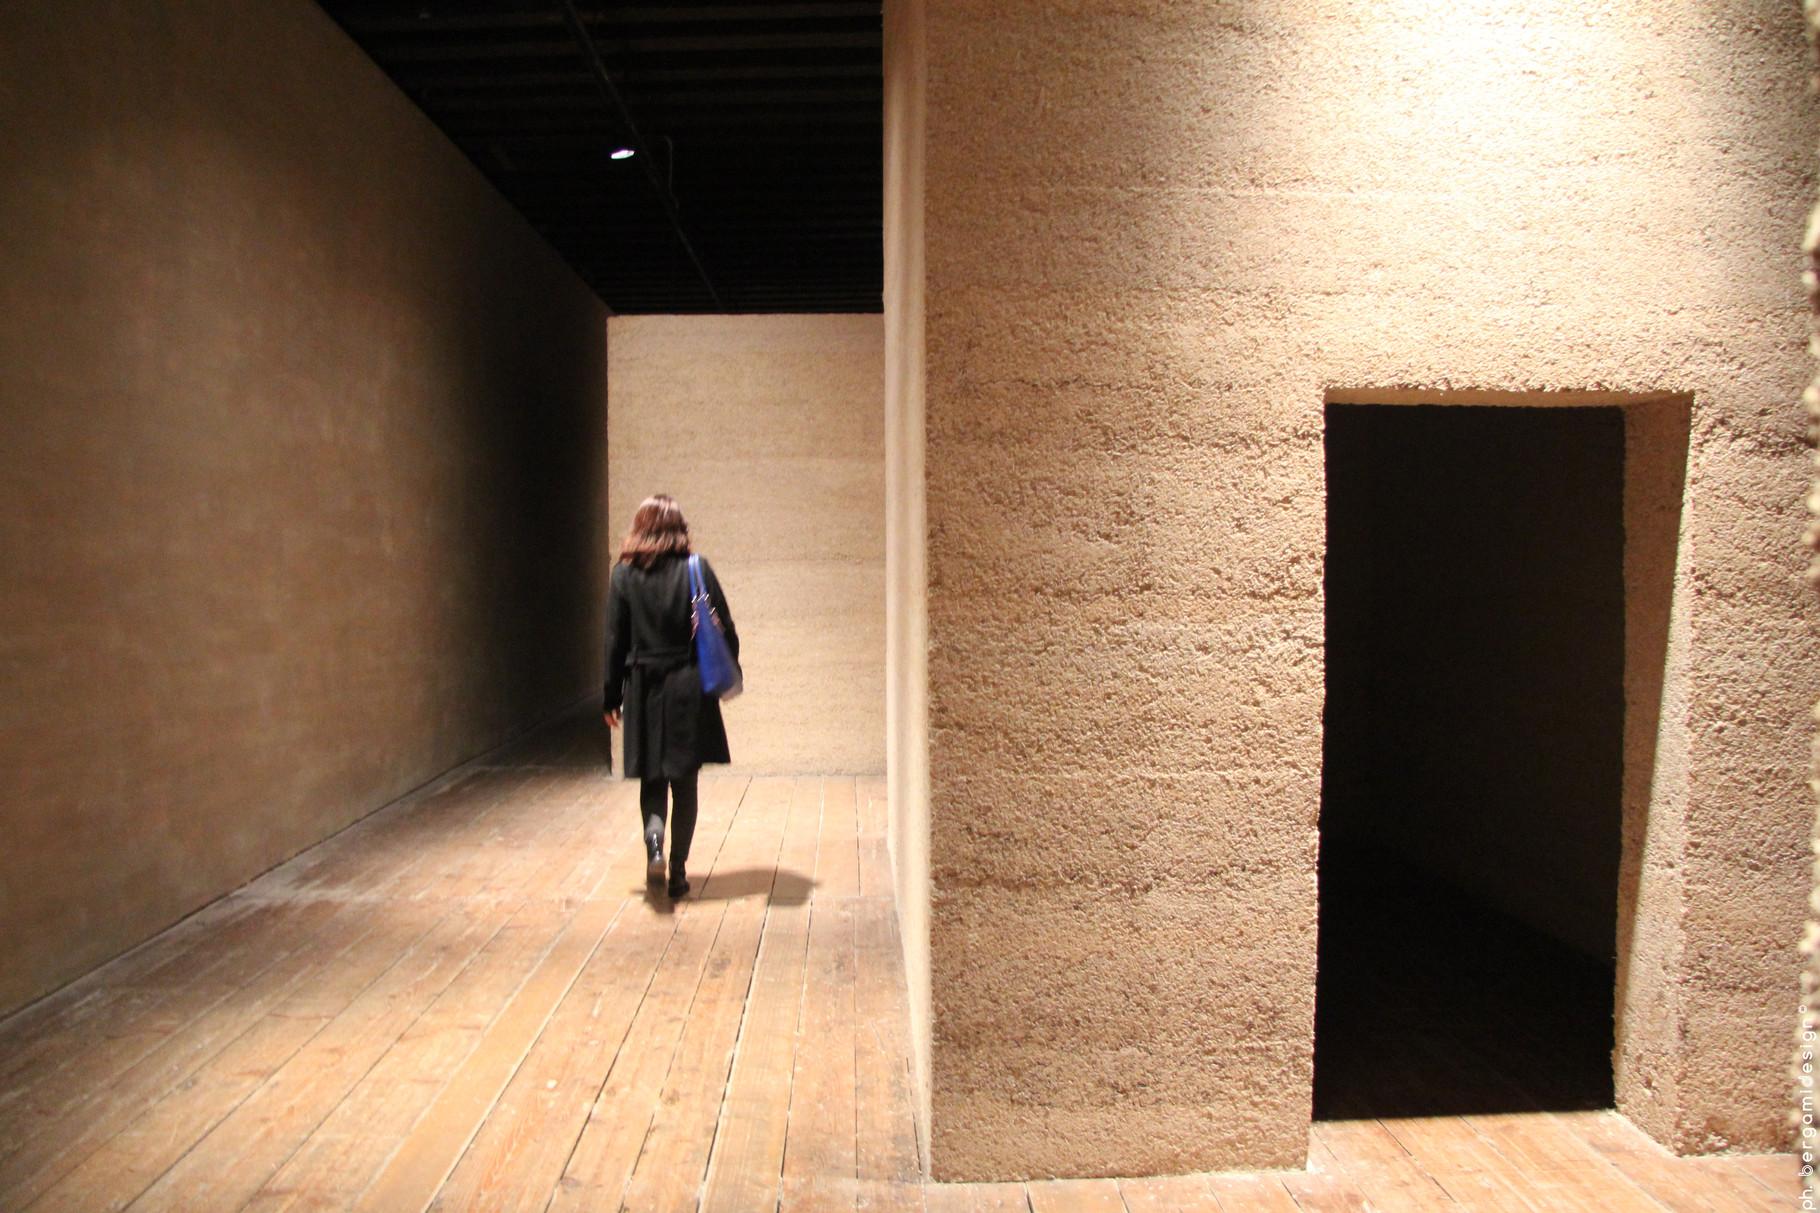 Cinque padiglioni architettonici, Axel Vervoordt, Tatsuro Miki e Jorgen Hempel